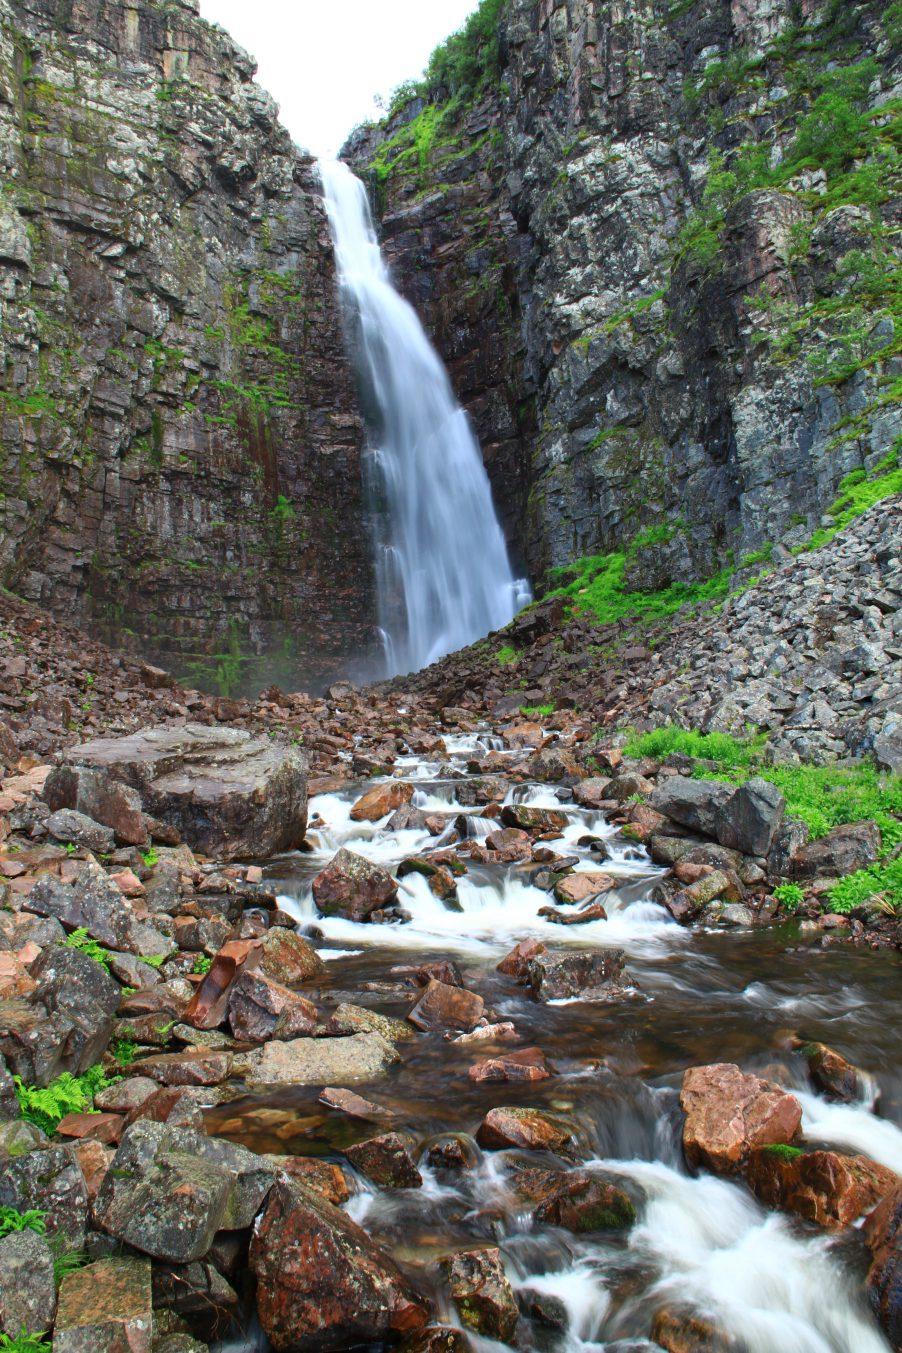 Njupskär Waterfall